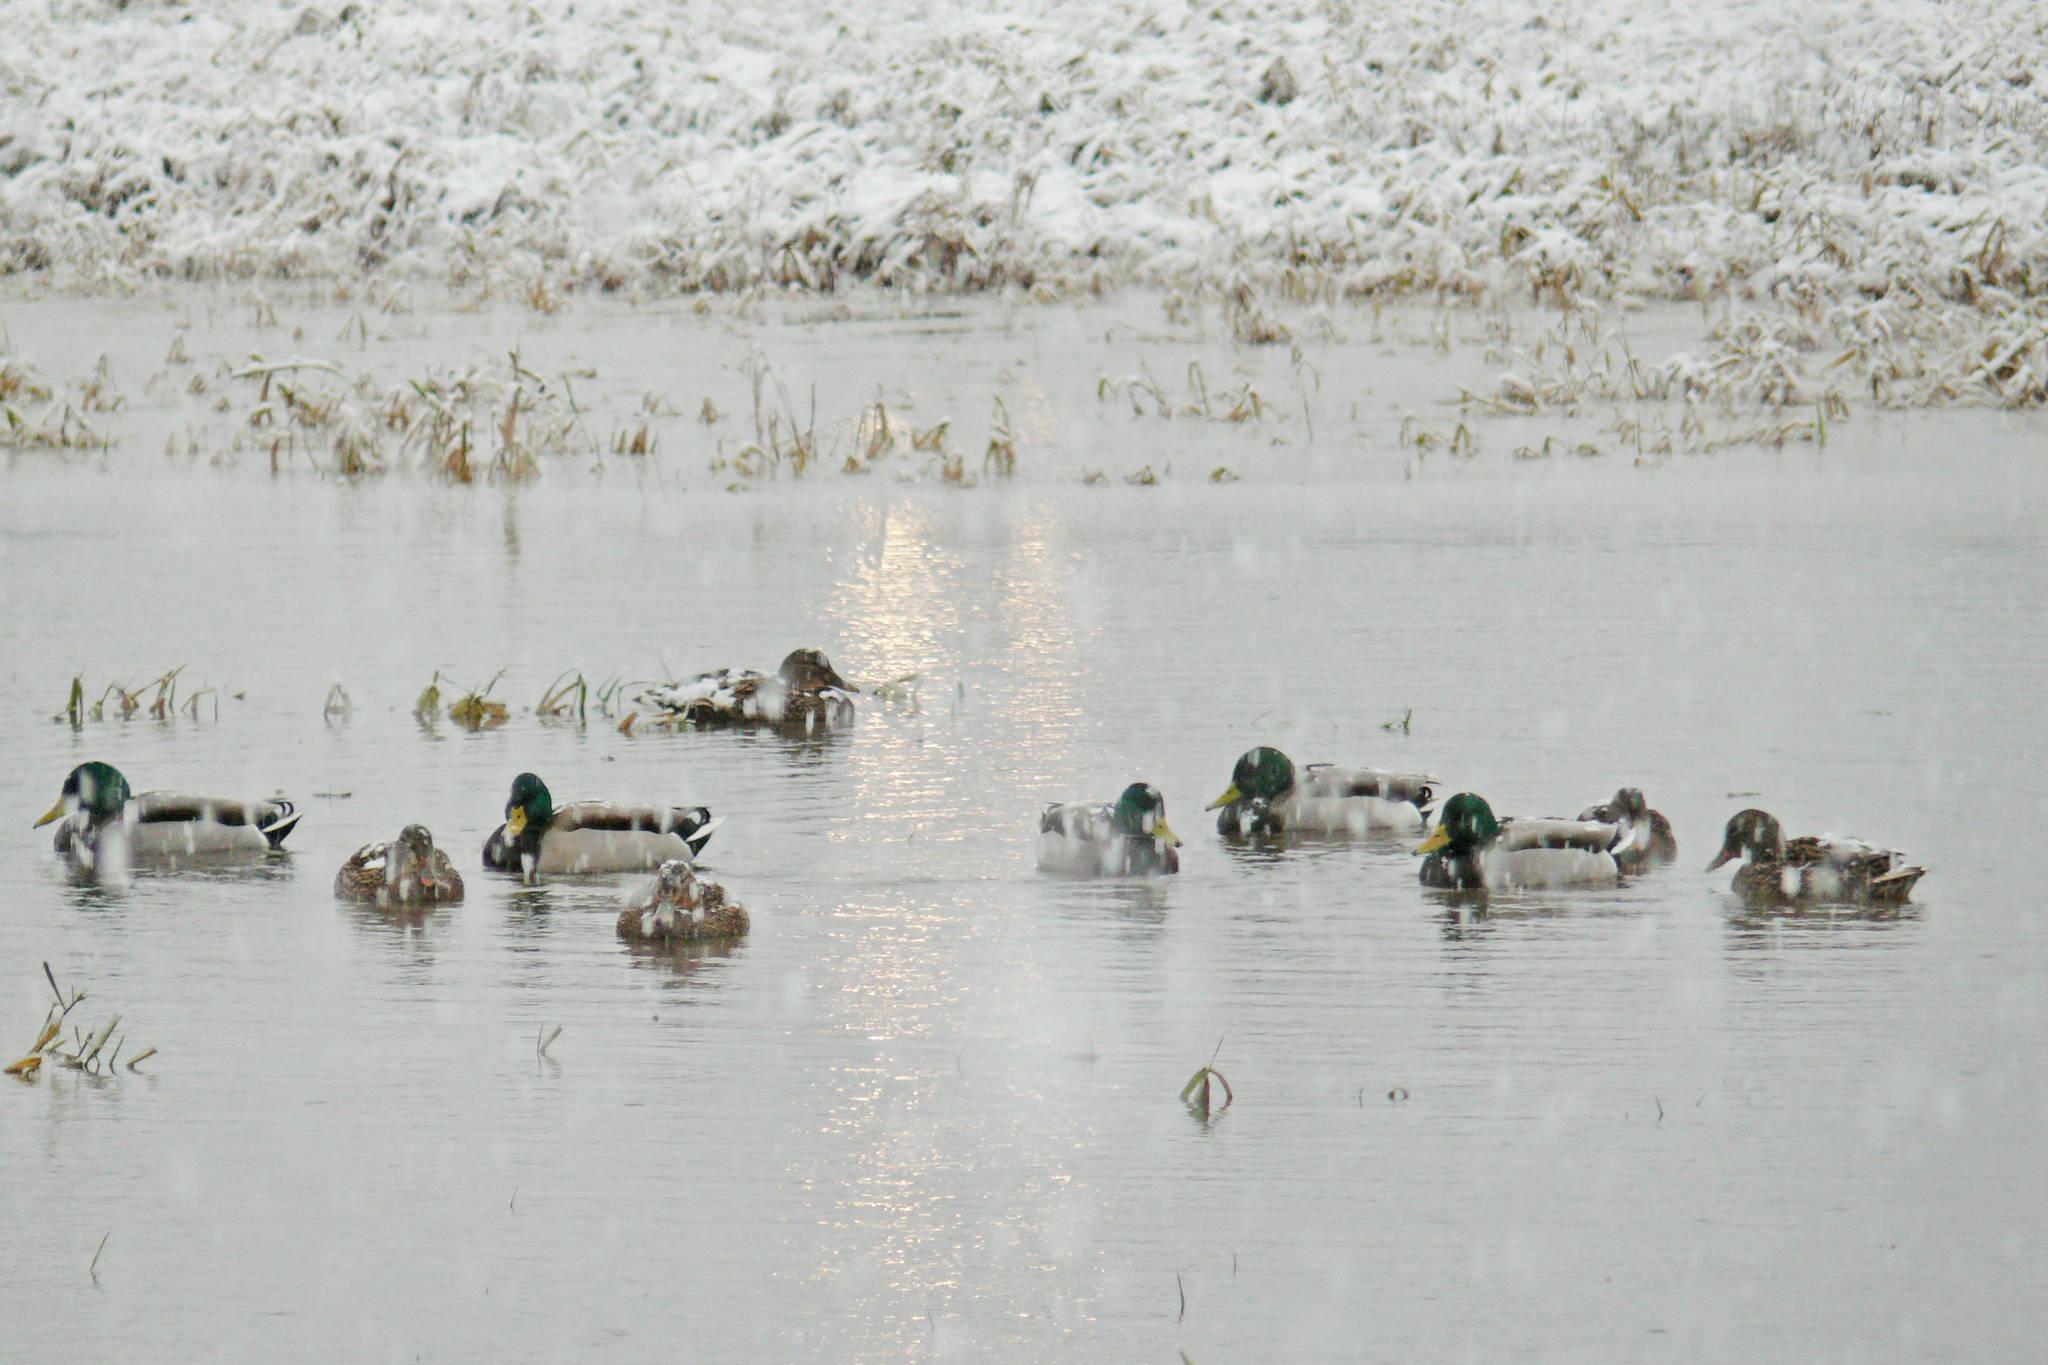 Winter arrived in Langley Monday, Dec. 21, dumping damp snow. Ducks were undeterred. (Dan Ferguson/Langley Advance Times)